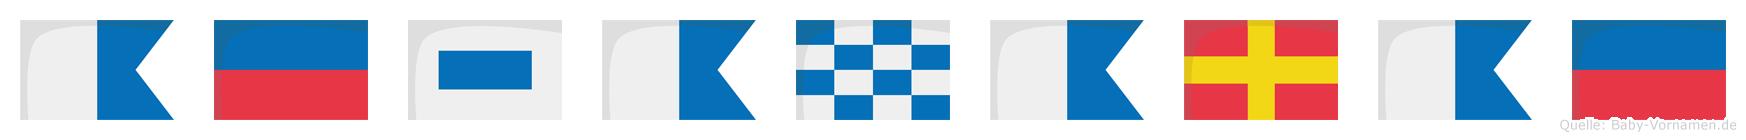 Aesanarae im Flaggenalphabet